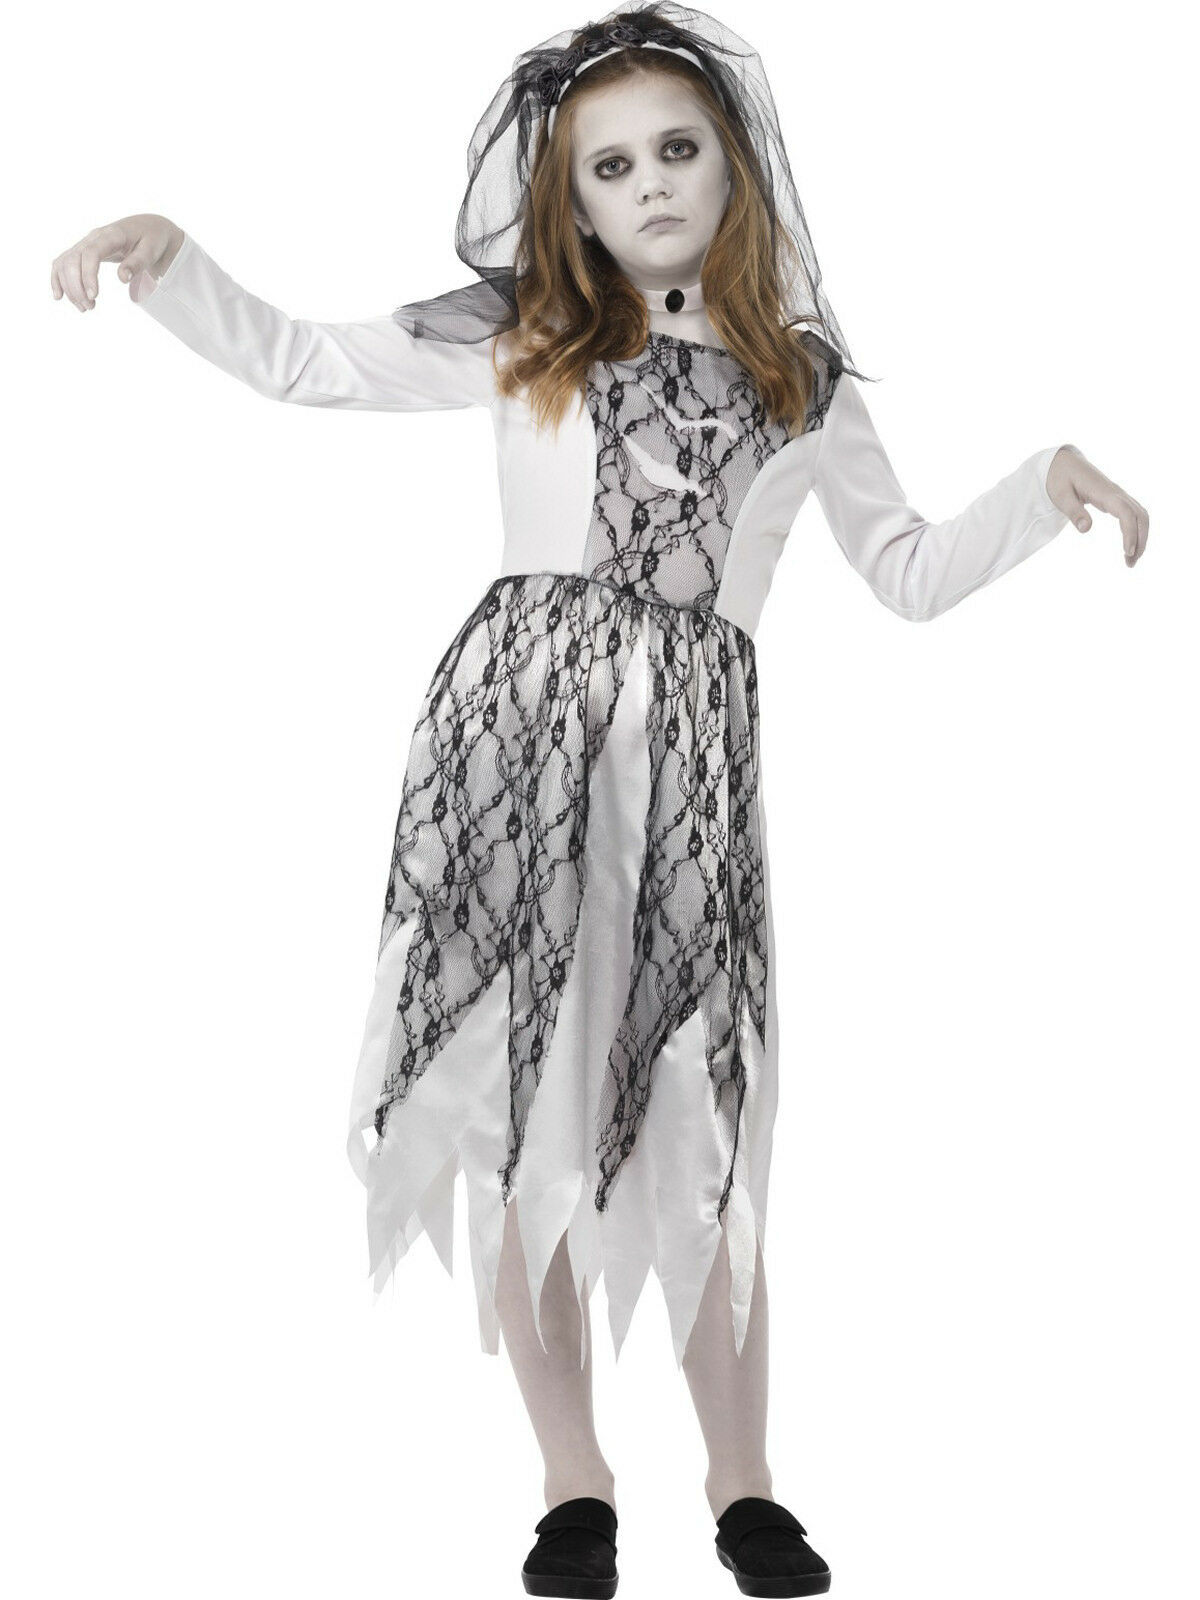 Ghost Dead Corpse Bride Girls Childs Kids Halloween Fancy Dress Costume 4-12